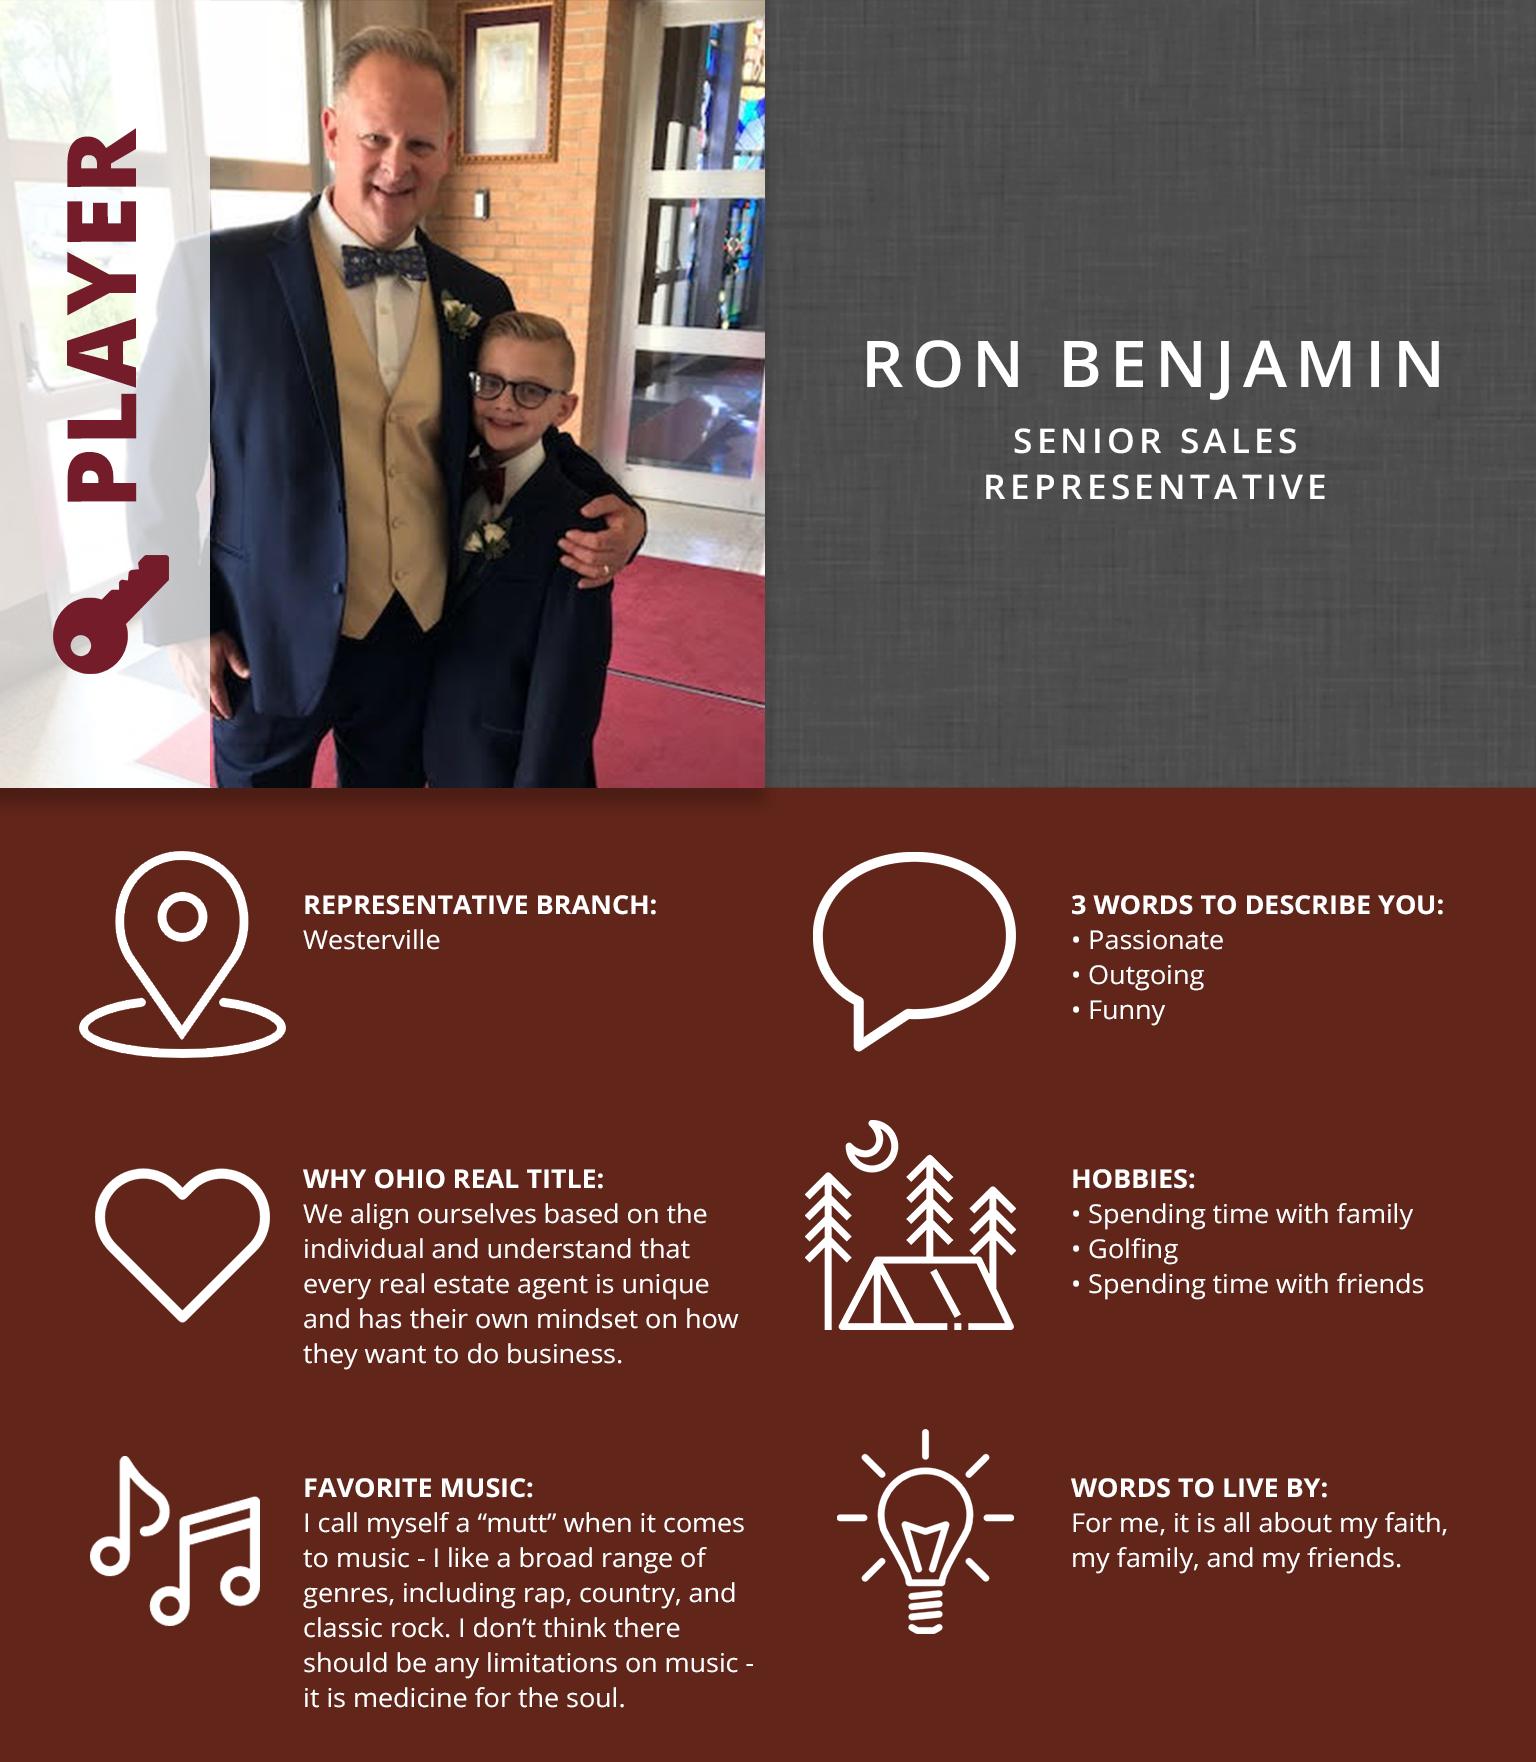 Ron Benjamin